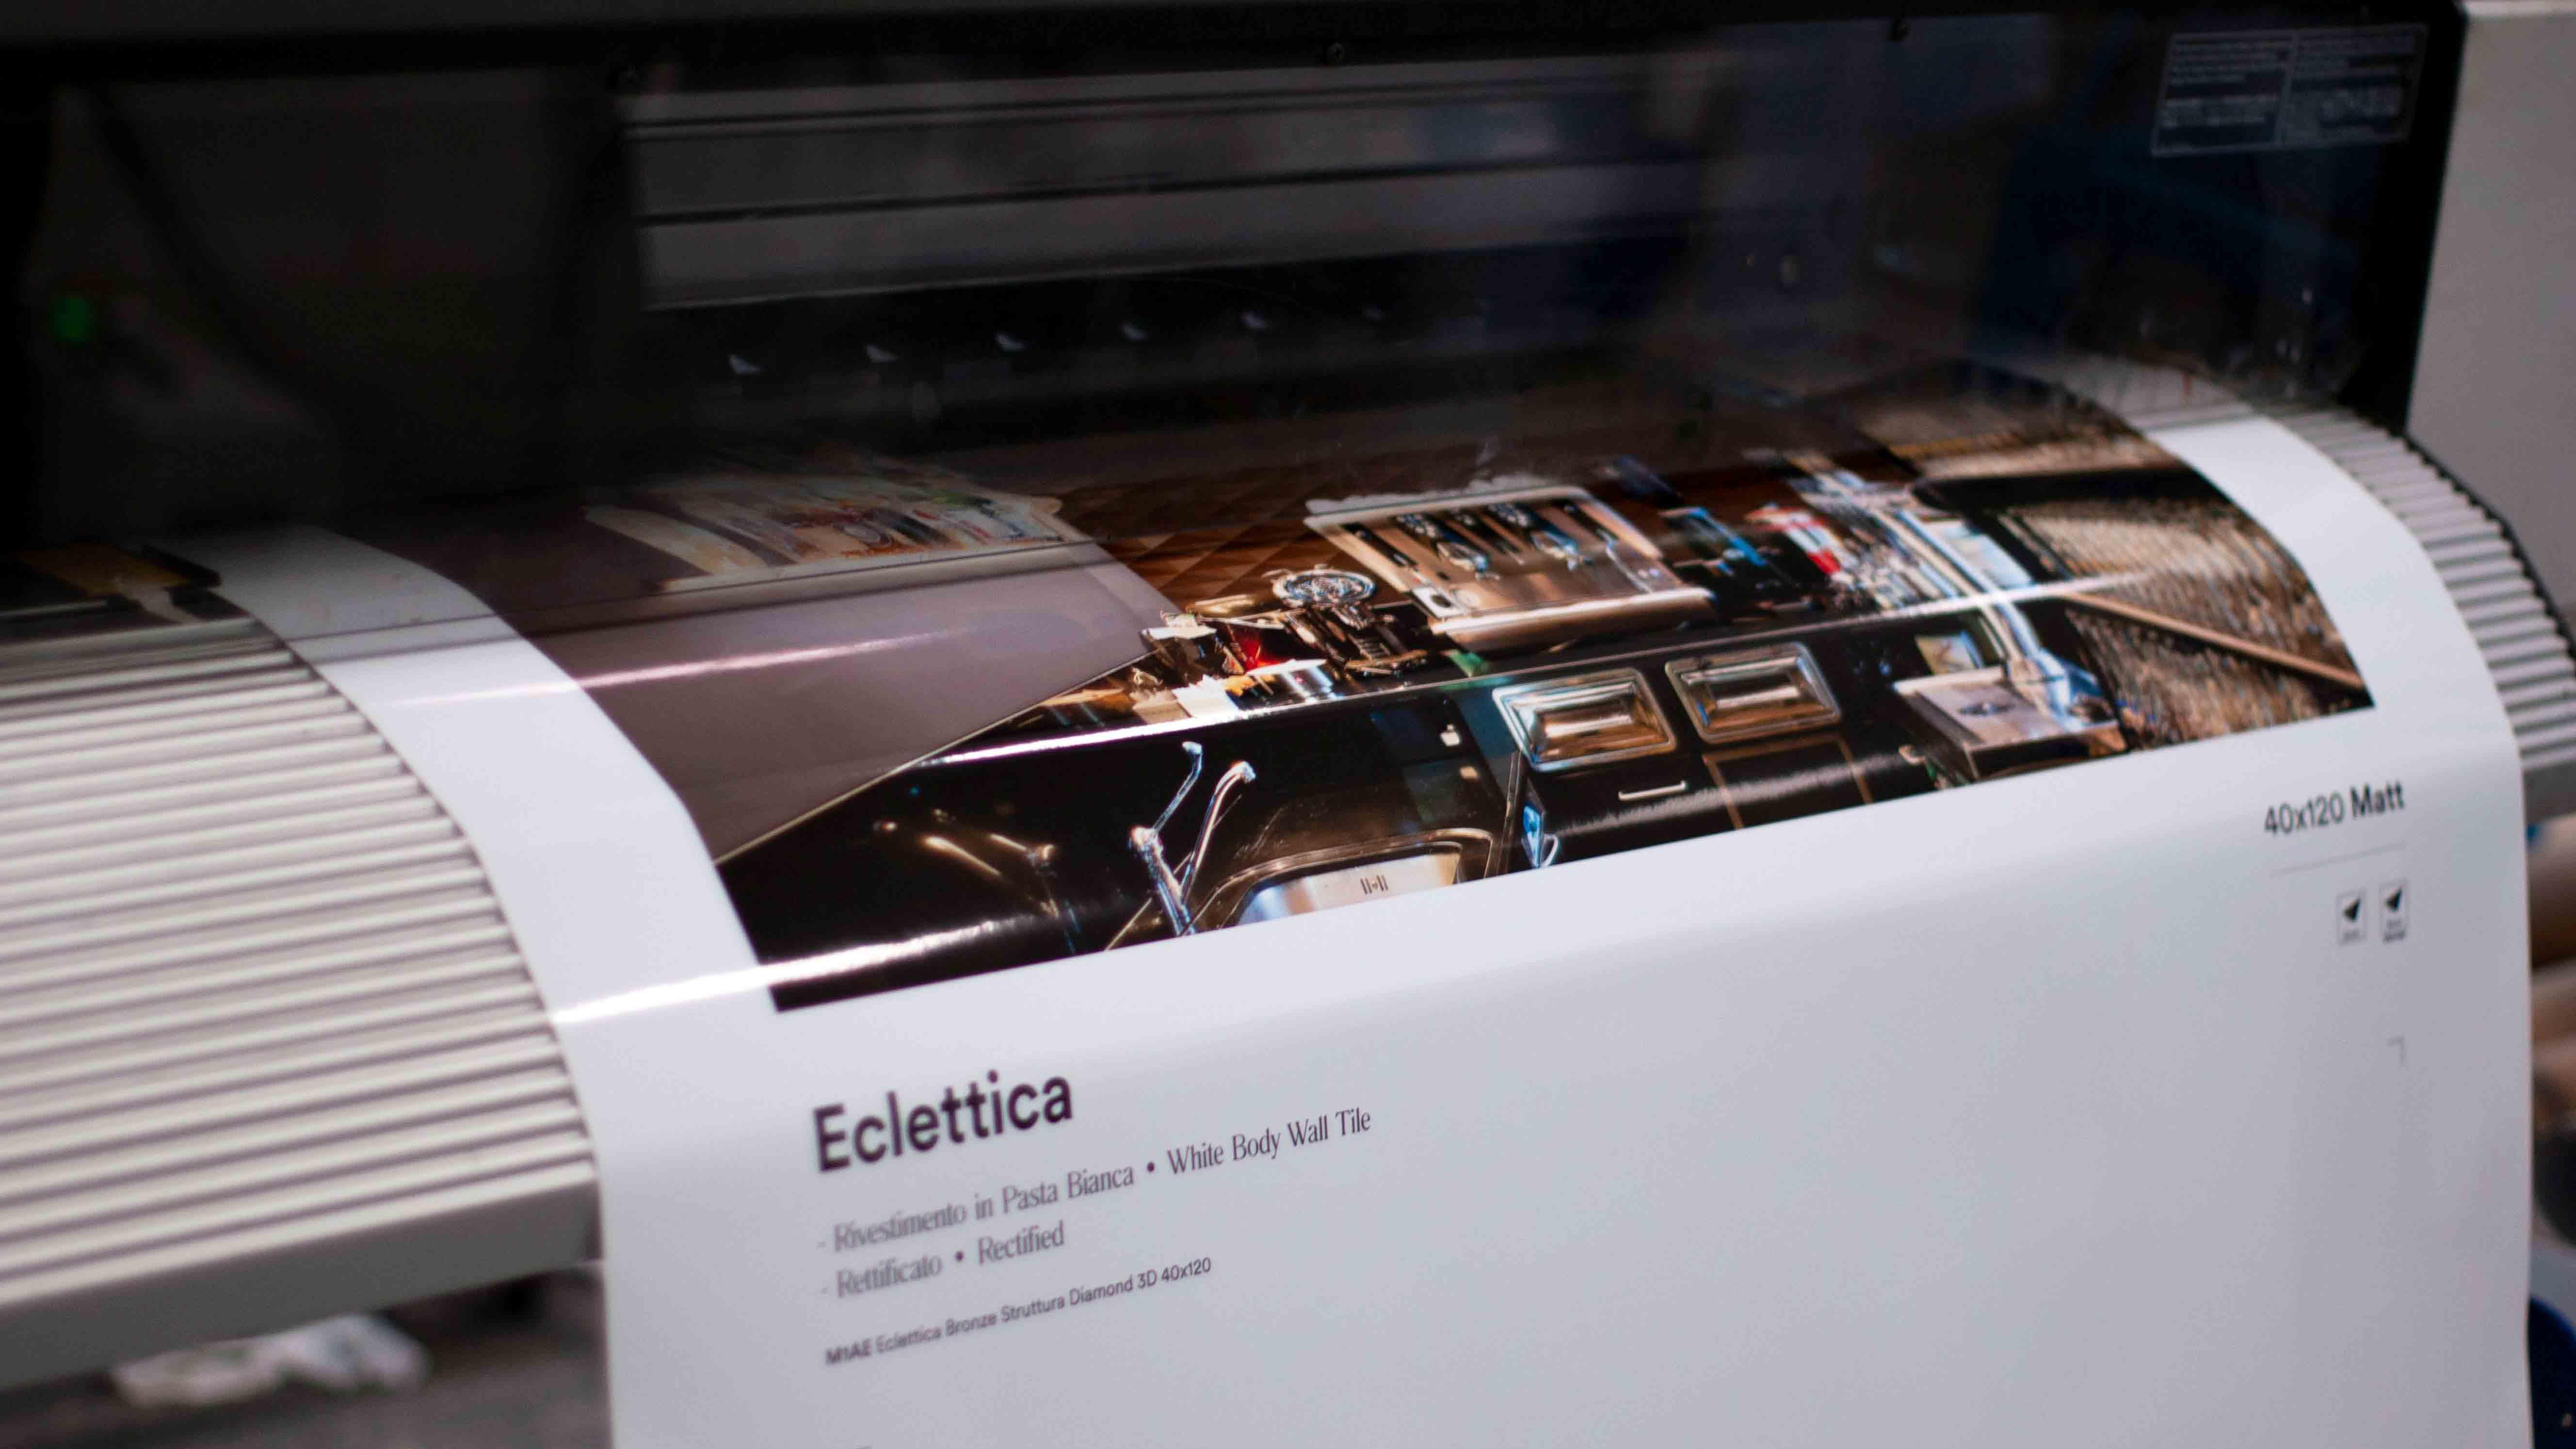 stampa digitale pannelli espositivi per ceramica